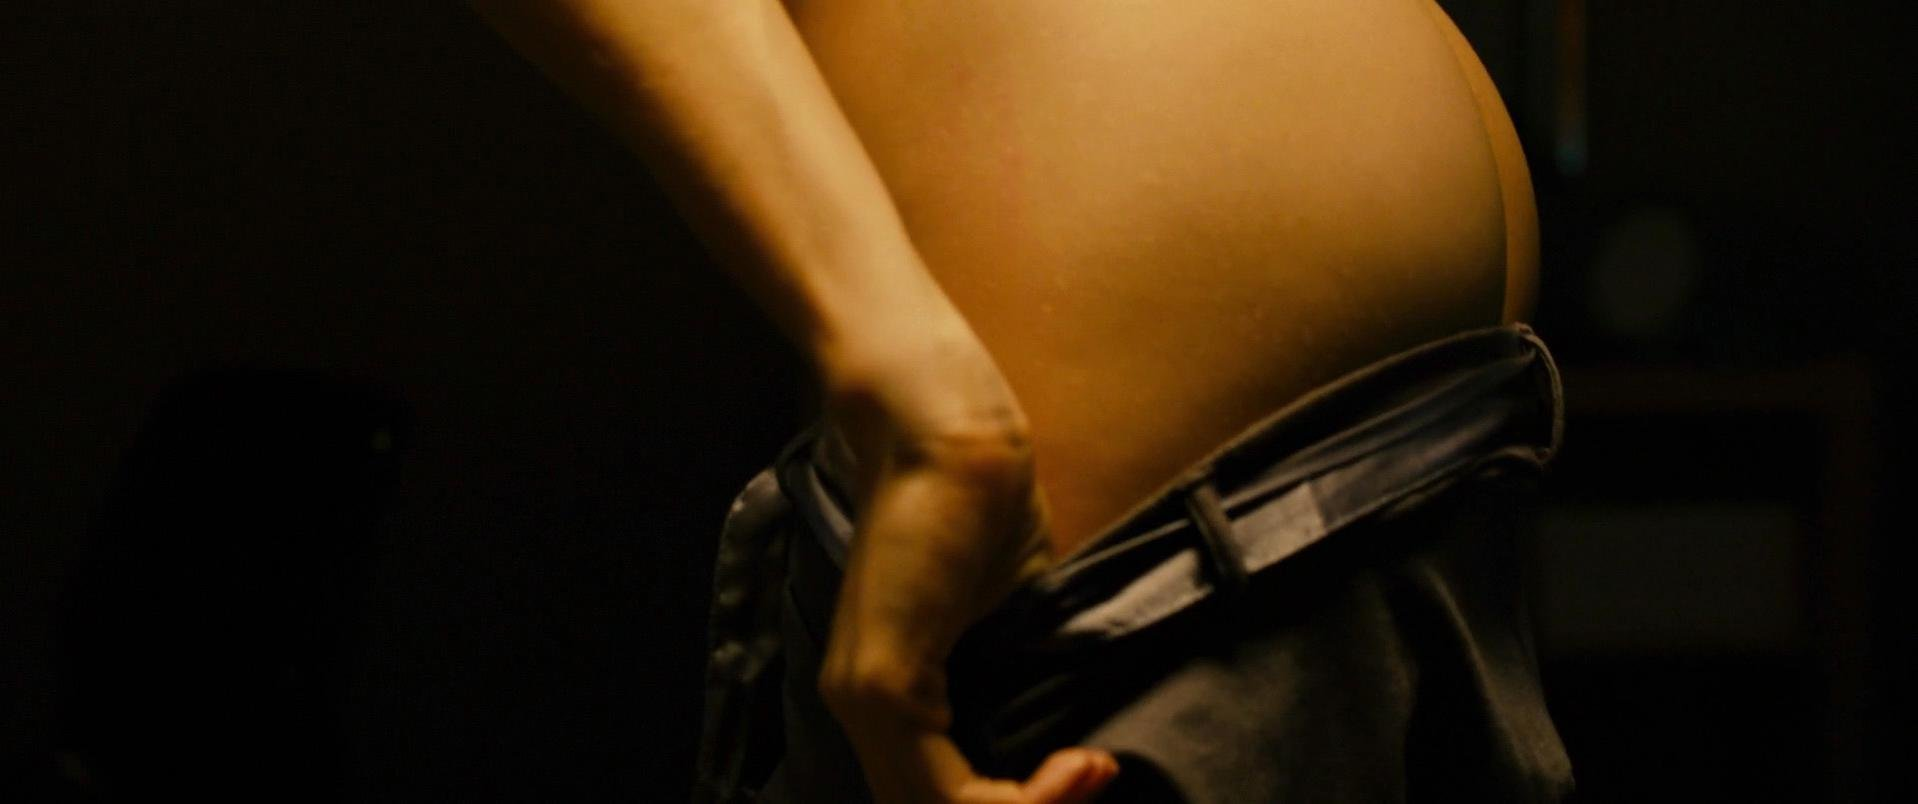 Ali Cobrin nude - Girlhouse (2014)